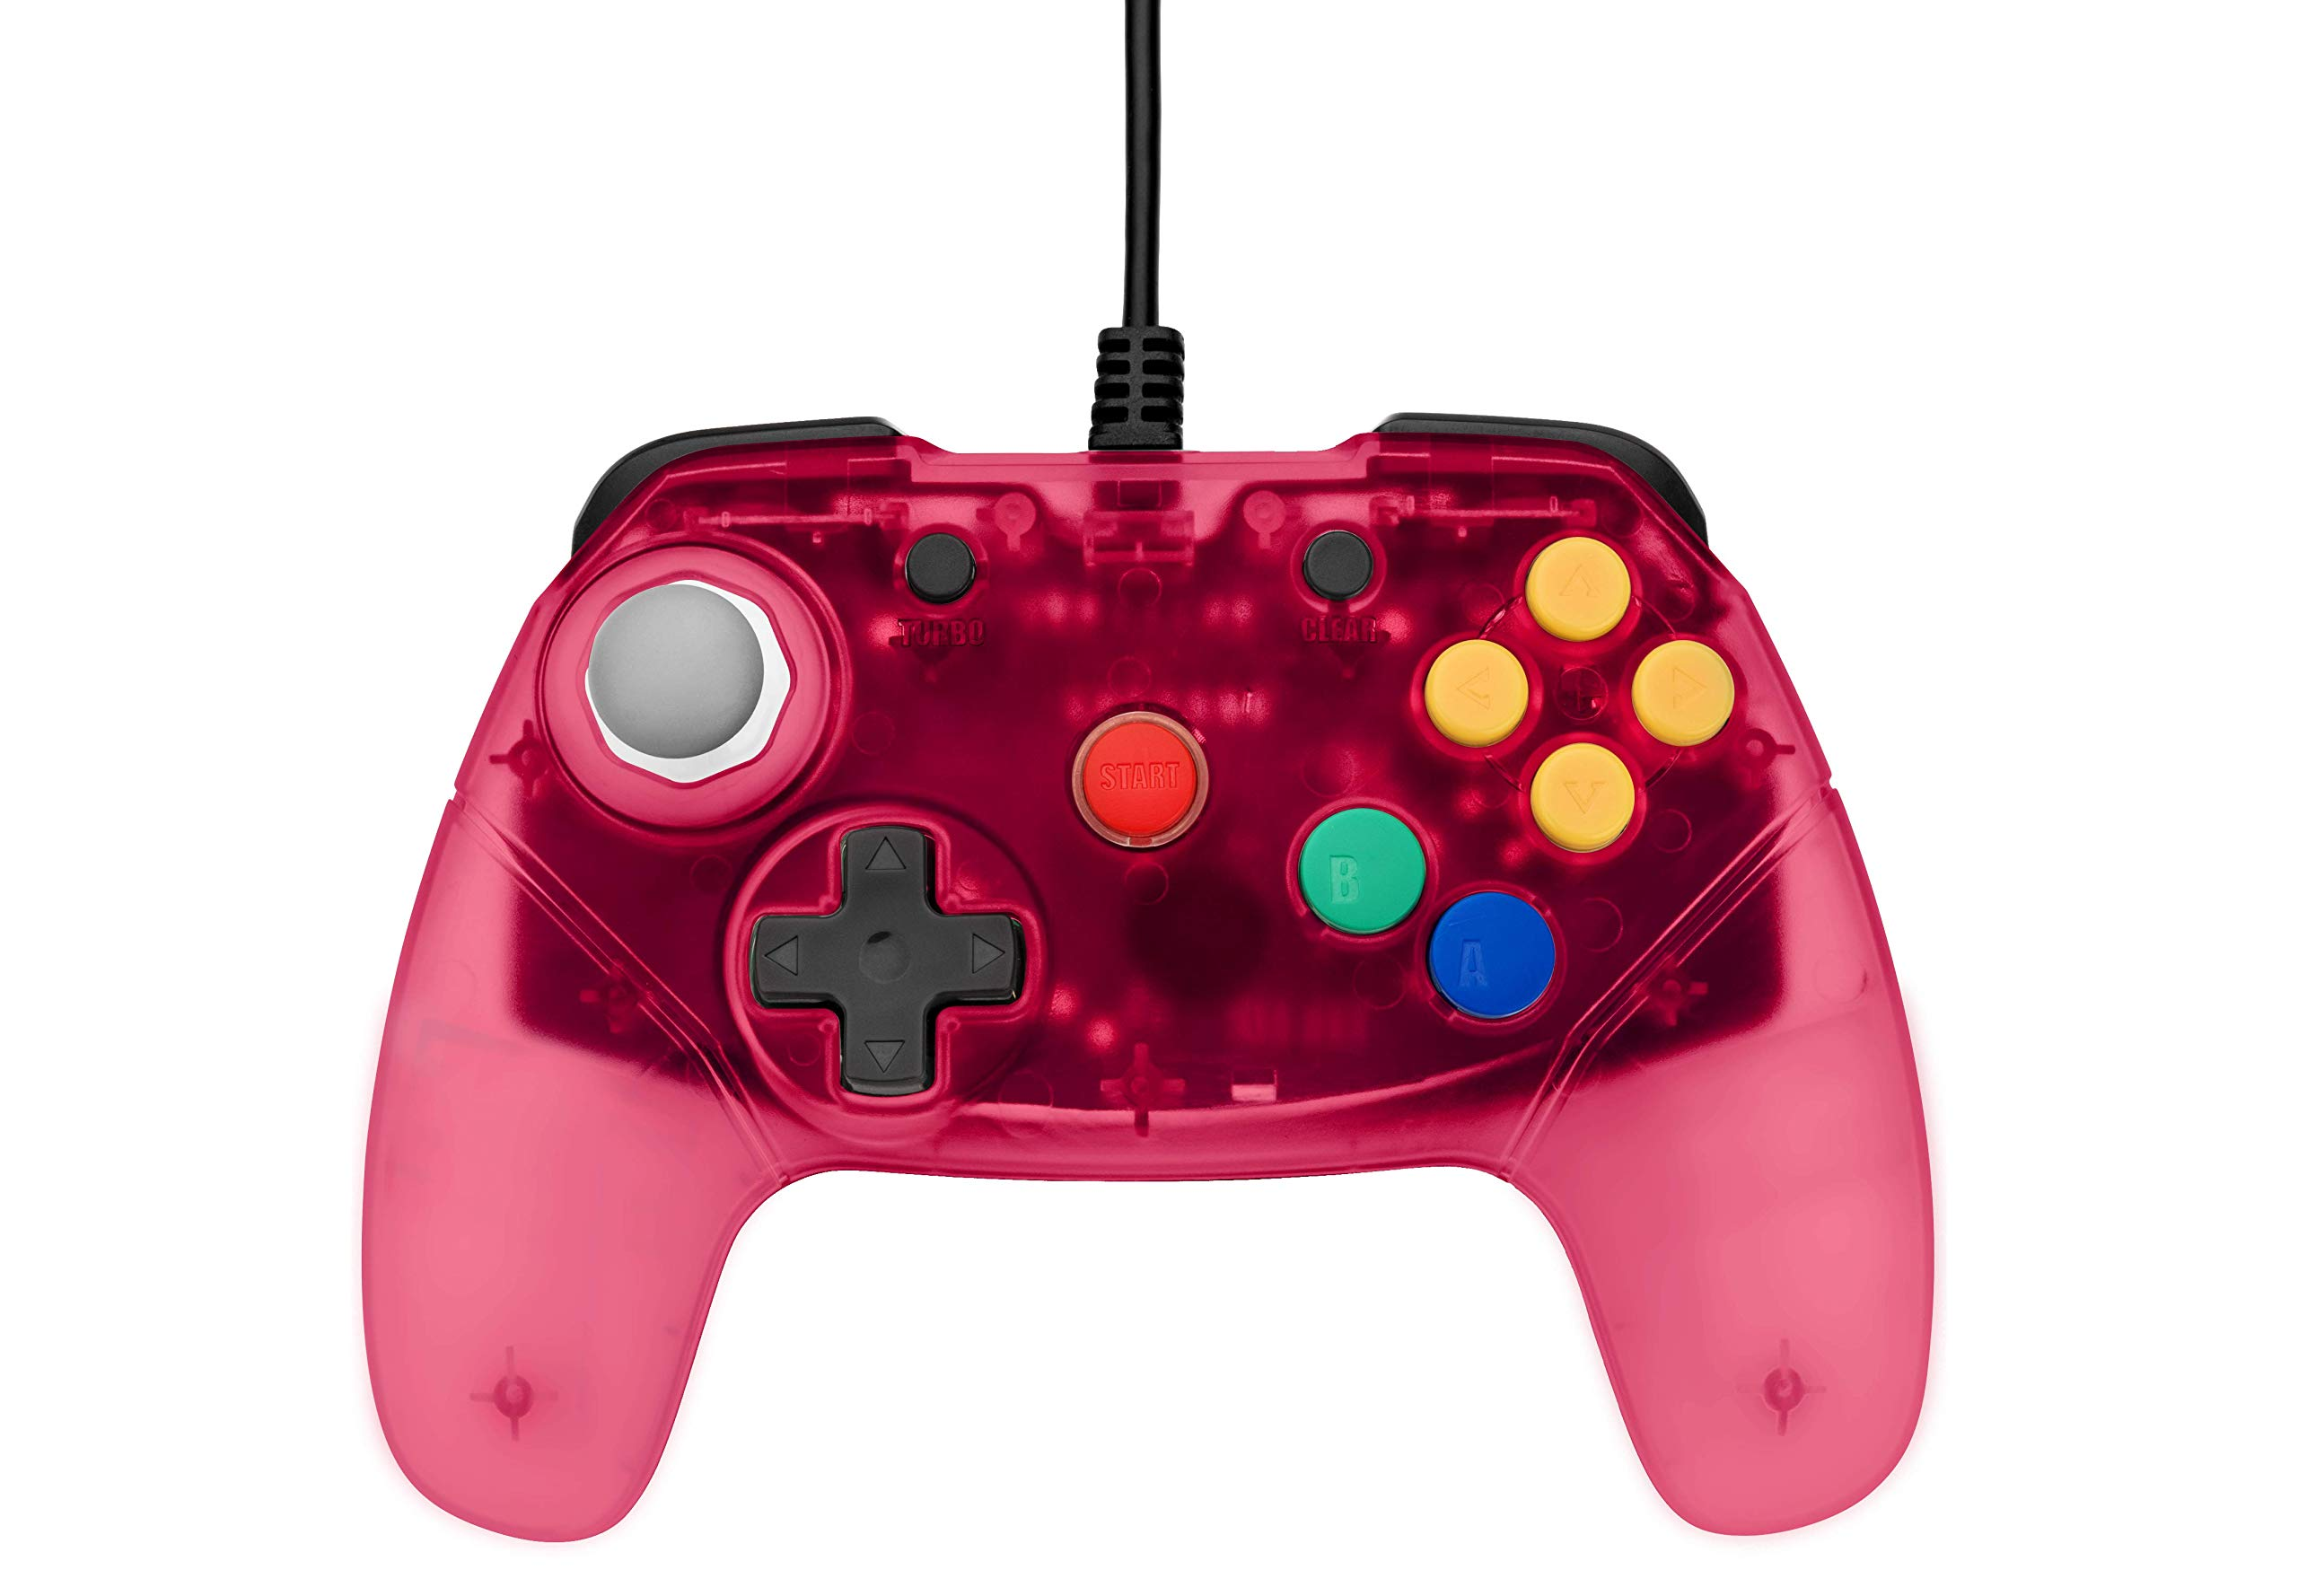 Retro Fighters Brawler64 Next Gen N64 Controller Game Pad - Nintendo 64 - Red